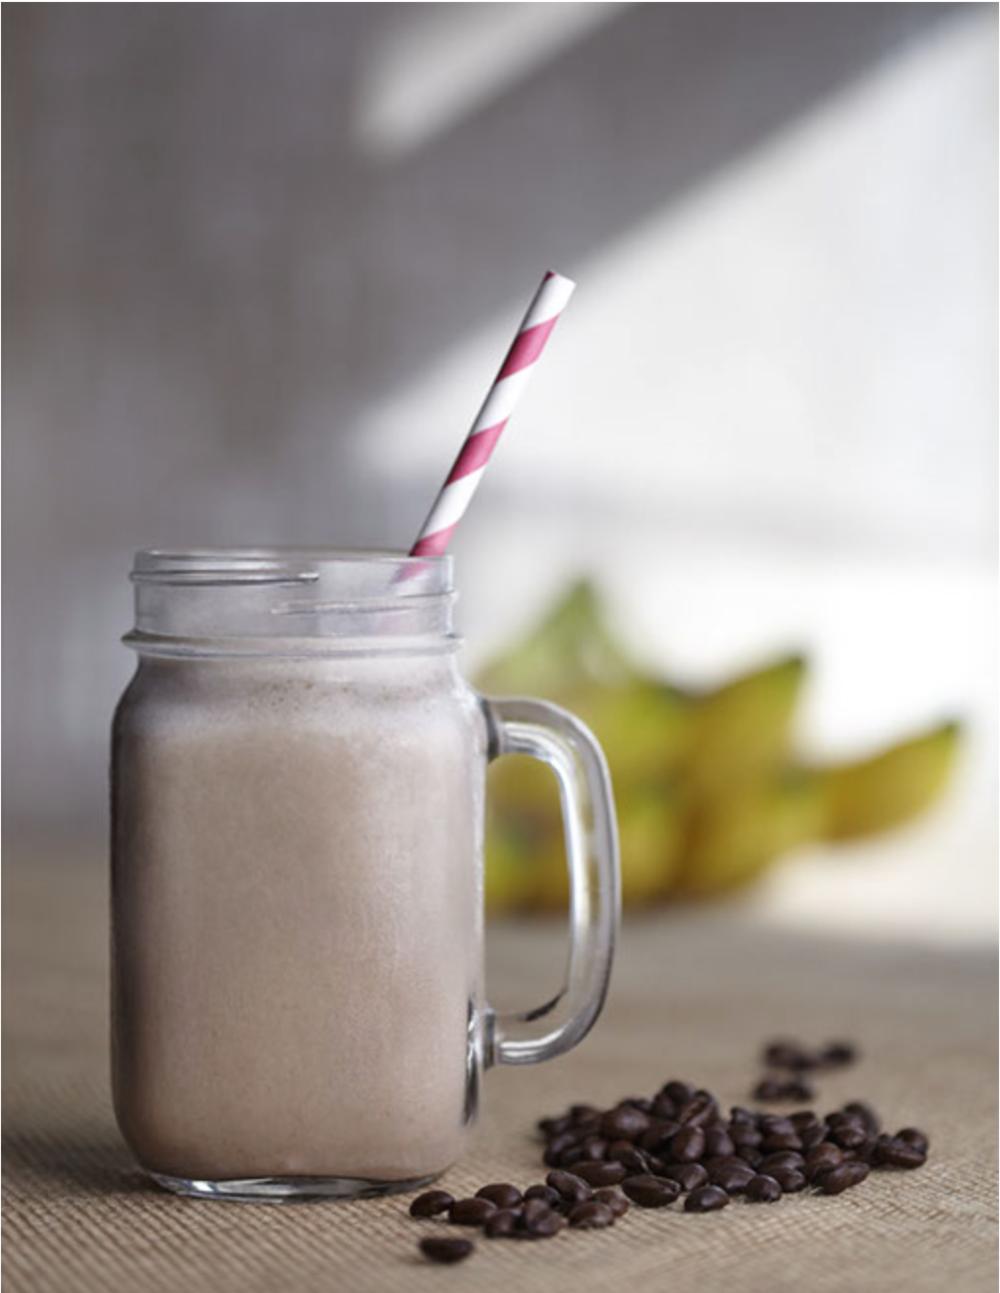 Banana Coffee Shake 1 - Medium Banana 1 Scoop (25g) - Chocolate Coffee Protein 1 Tbsp - Flaxseed Oil 1 Cup - Milk/Almond Milk Handful of Ice